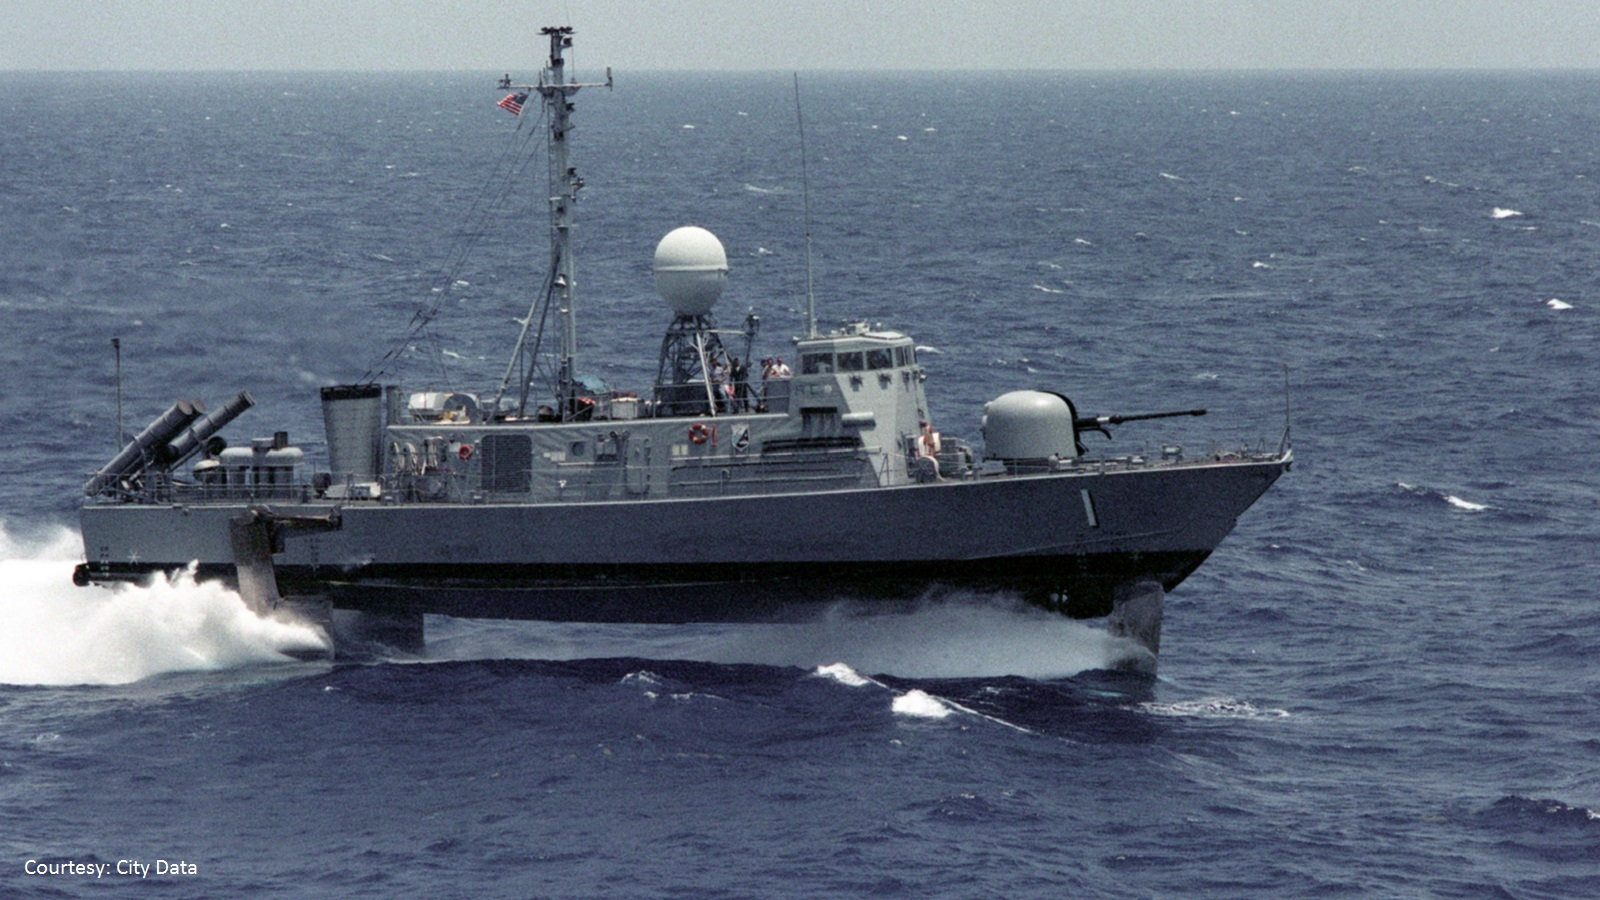 Navy Hydrofoil